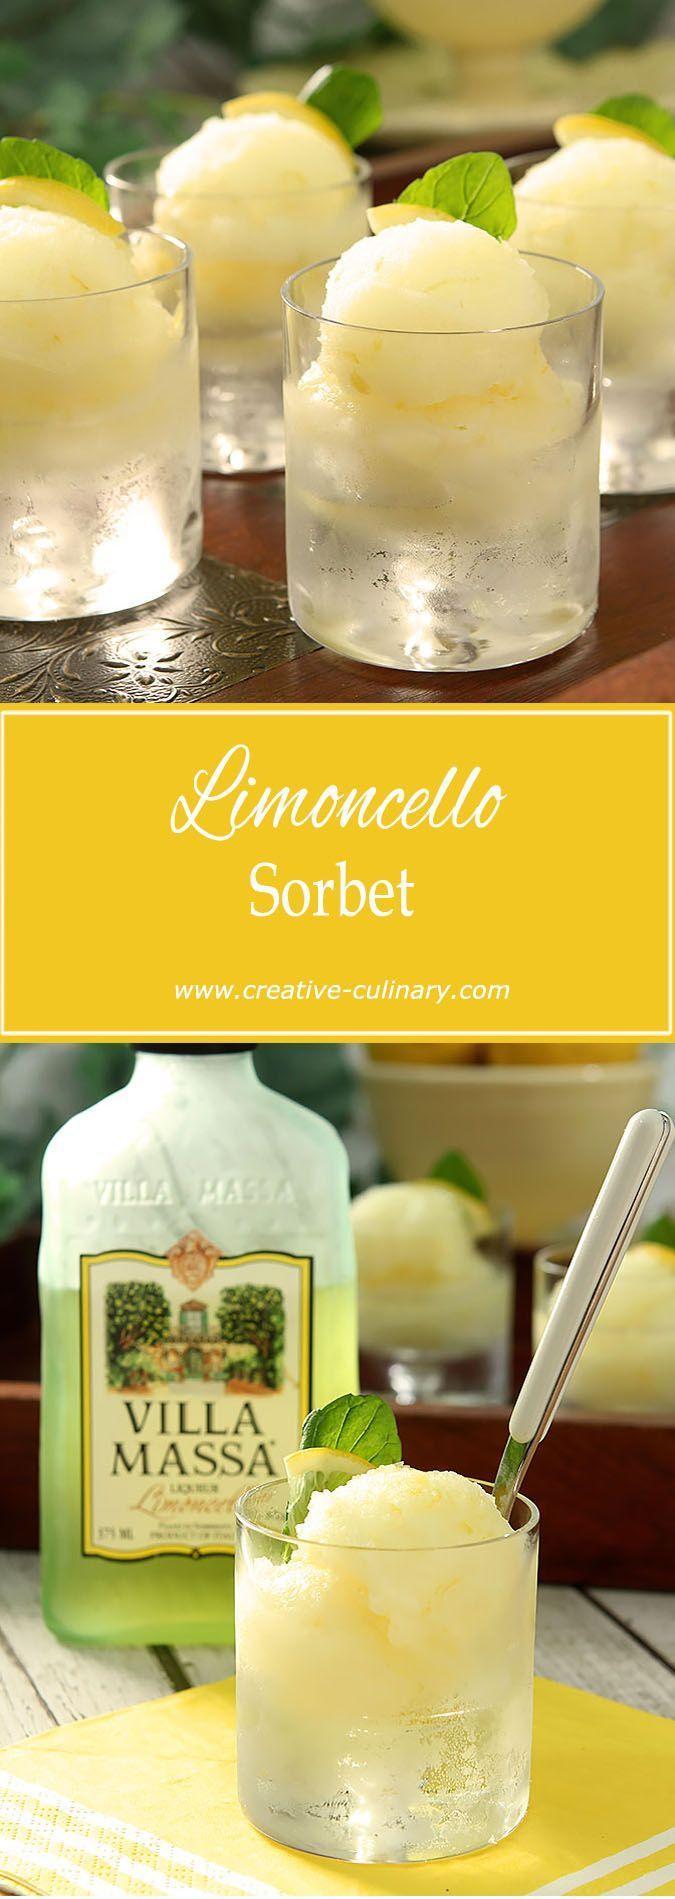 Wedding - Limoncello Sorbet